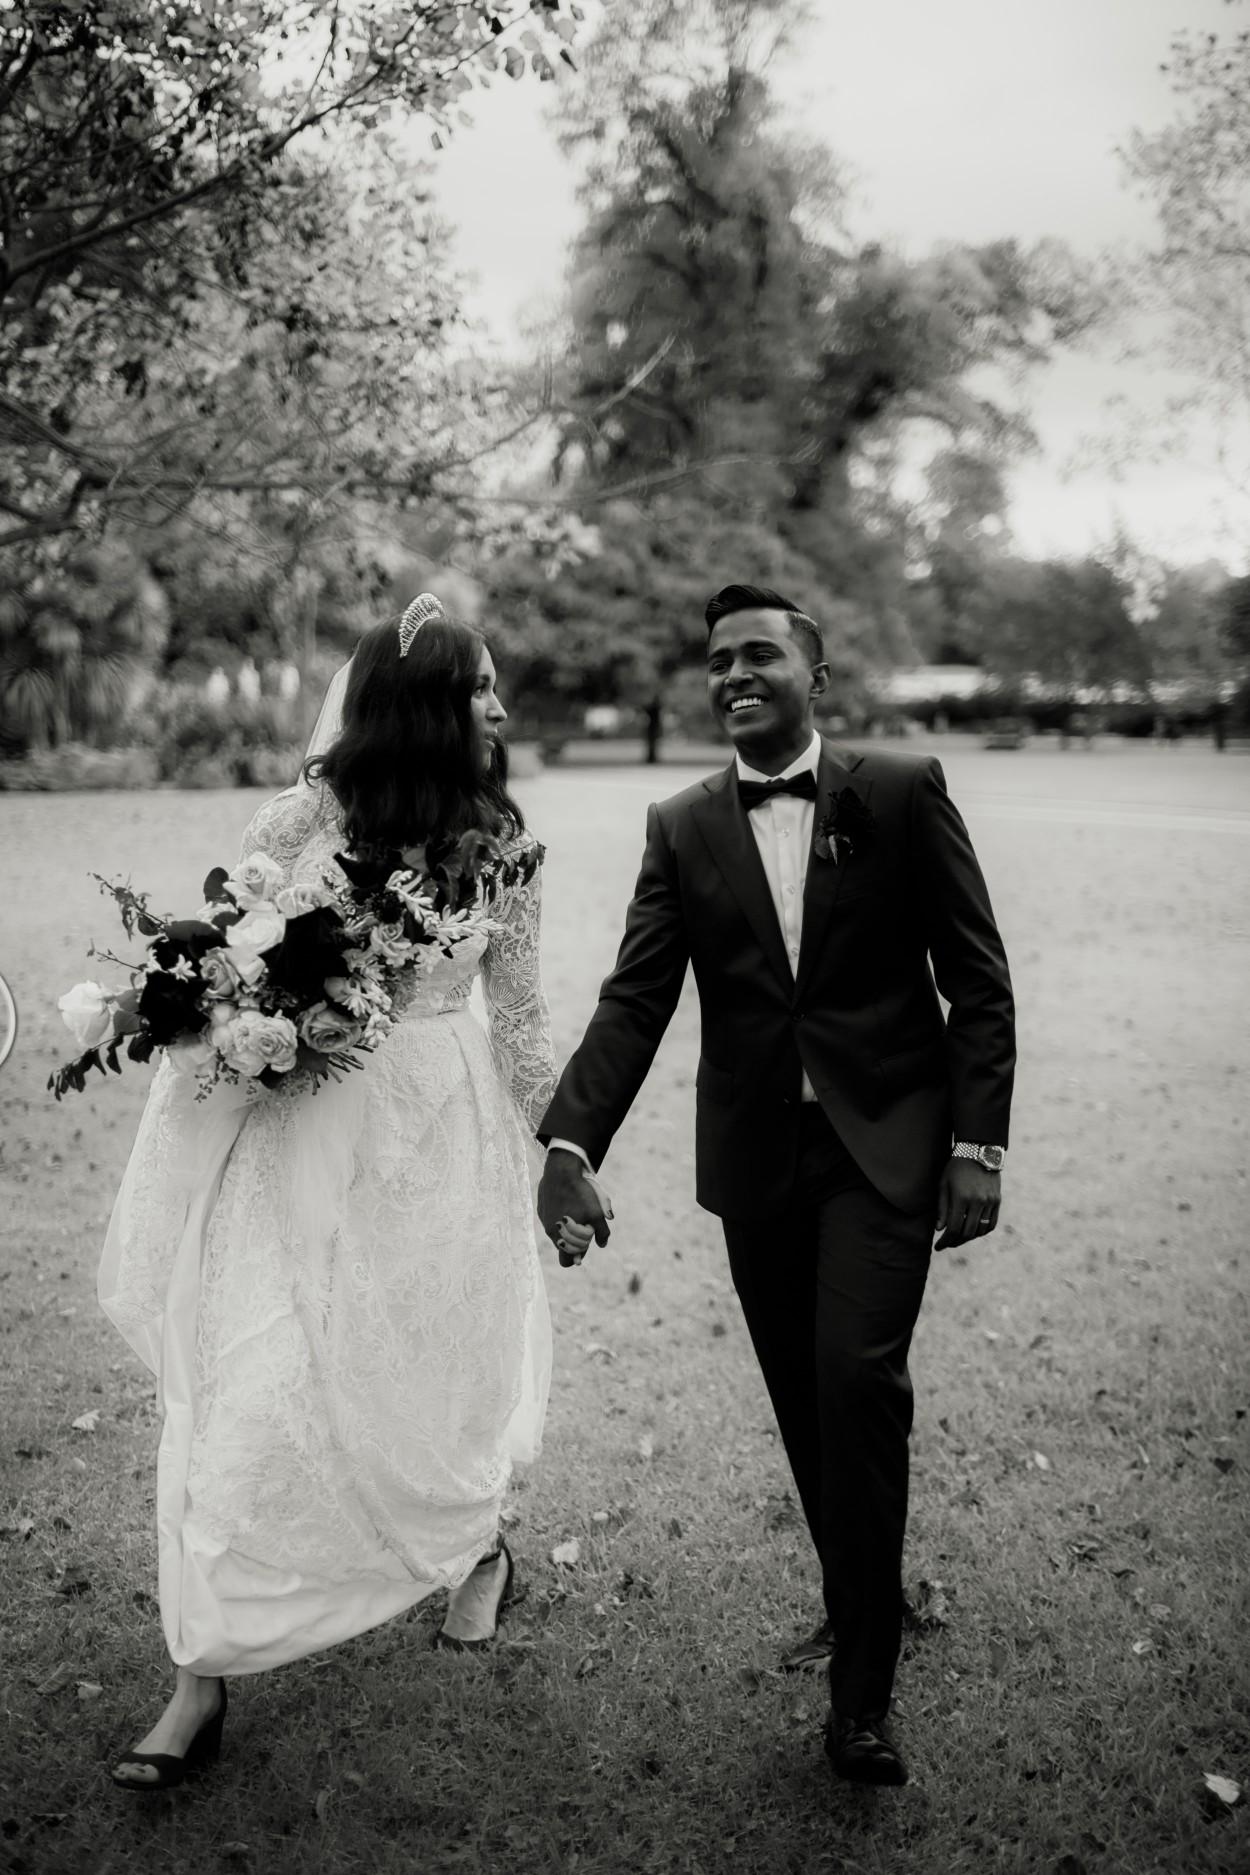 I-Got-You-Babe-Weddings-The-066George-Ballroom-St-Kilda-Wedding-Amy-Abhi.jpg